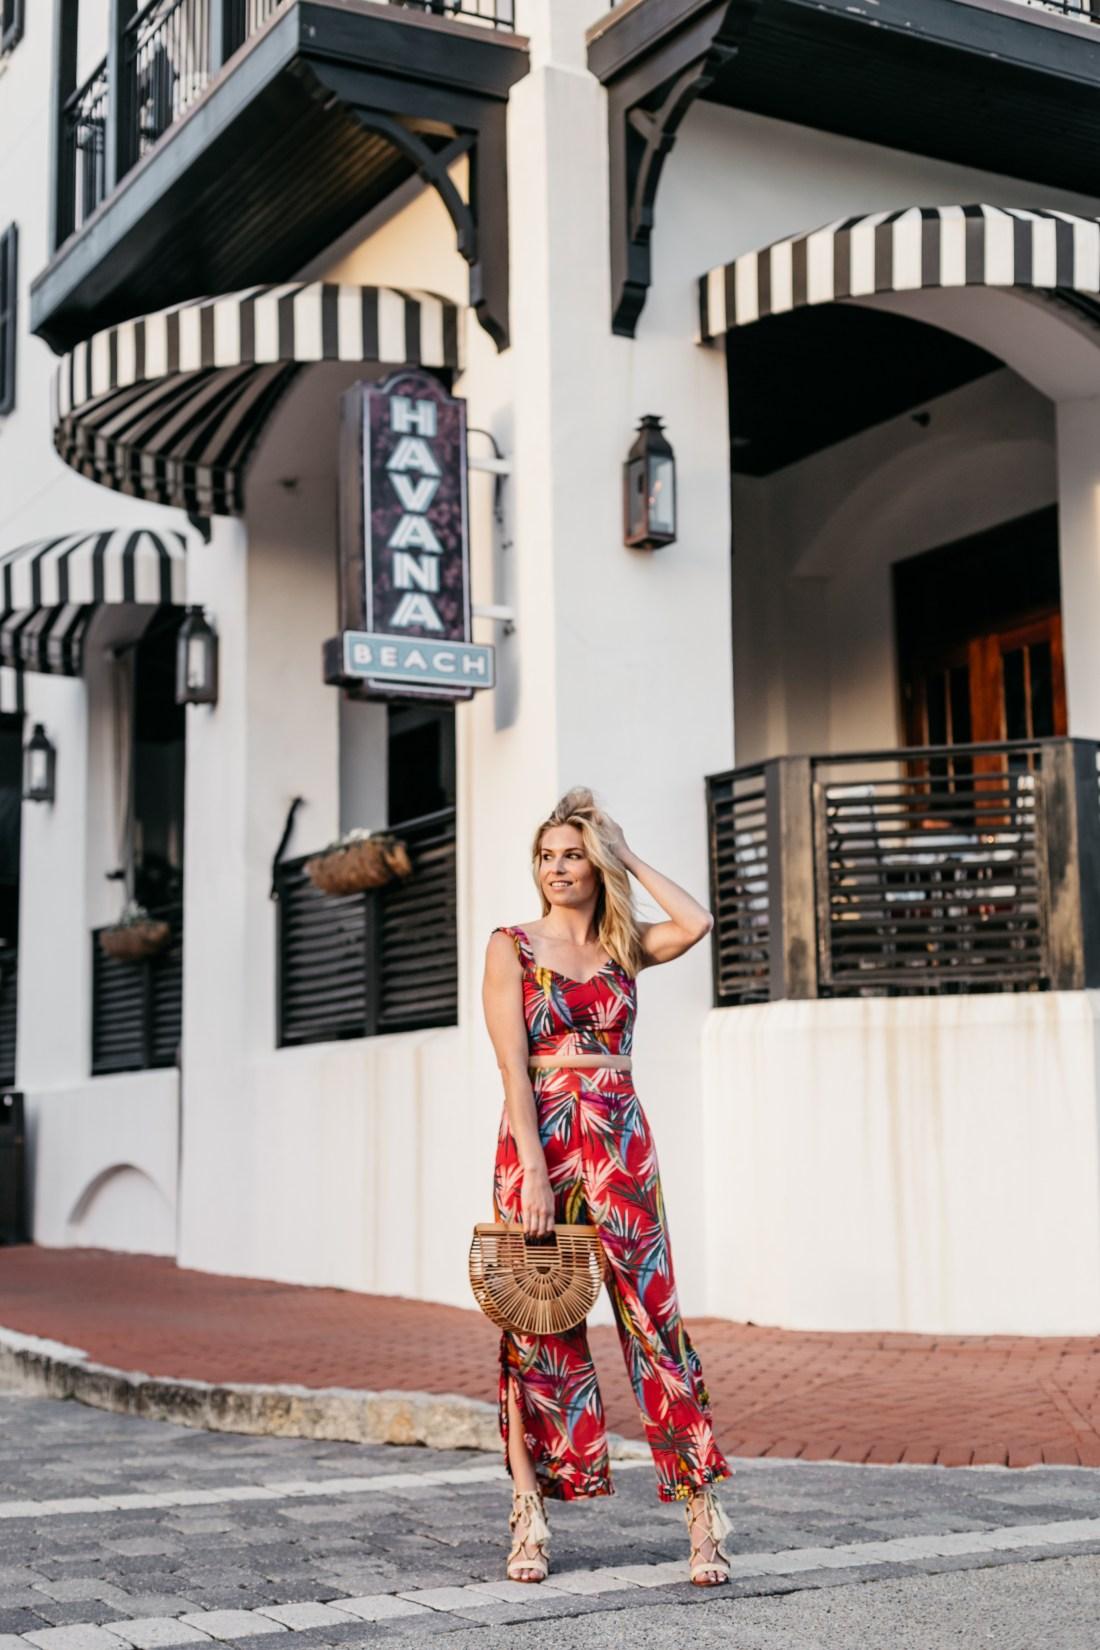 Brooke Burnett Outfit Details: Tropical Print Pants // Tropical Print Top // Strappy Sandals // Wooden Bag